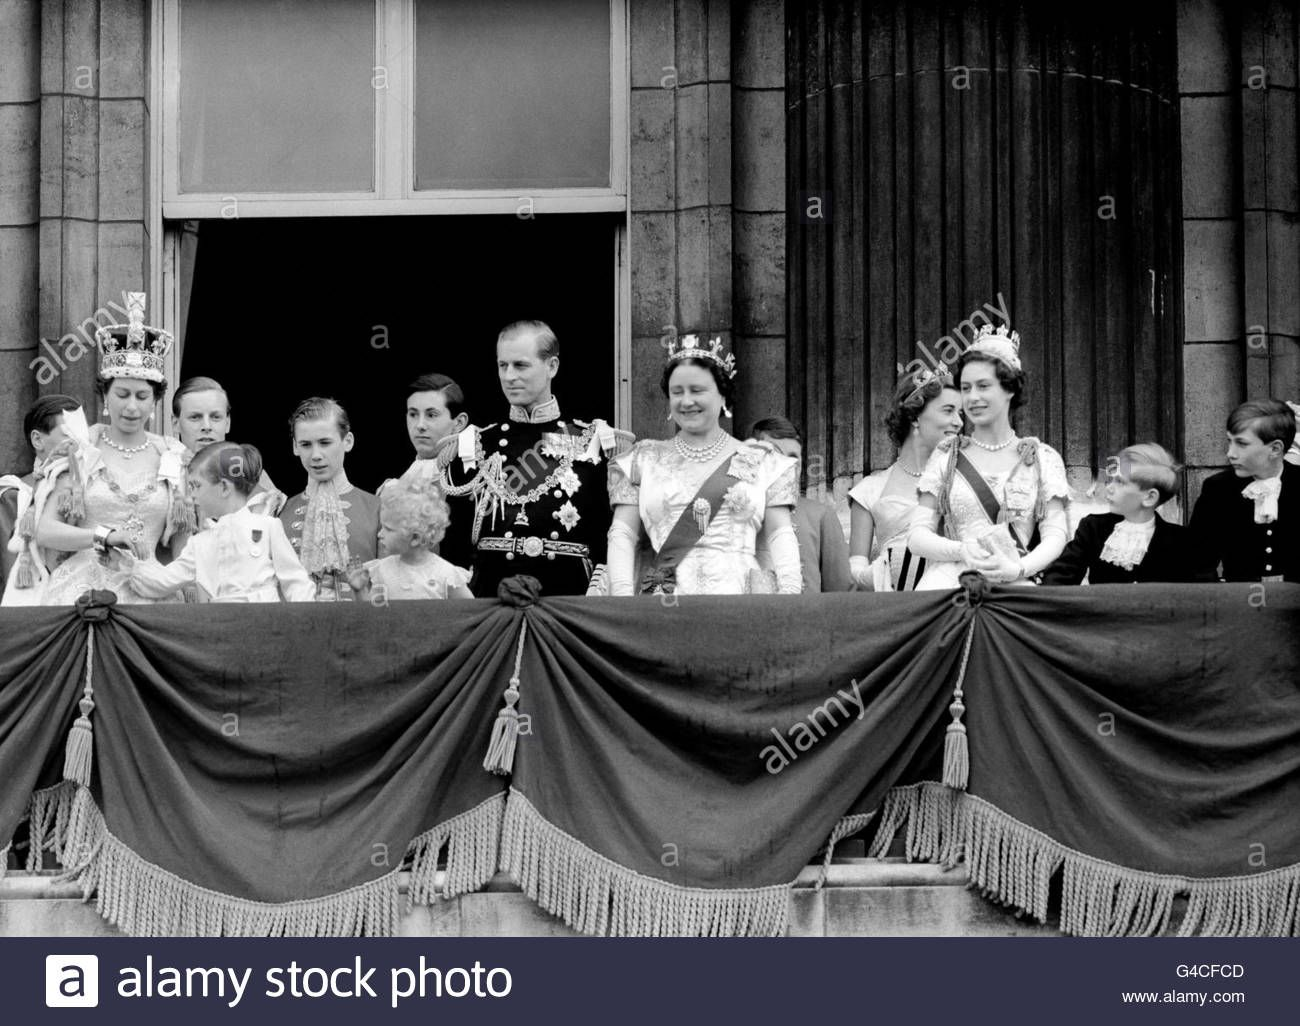 Queen's Coronation Queen's coronation, Buckingham palace